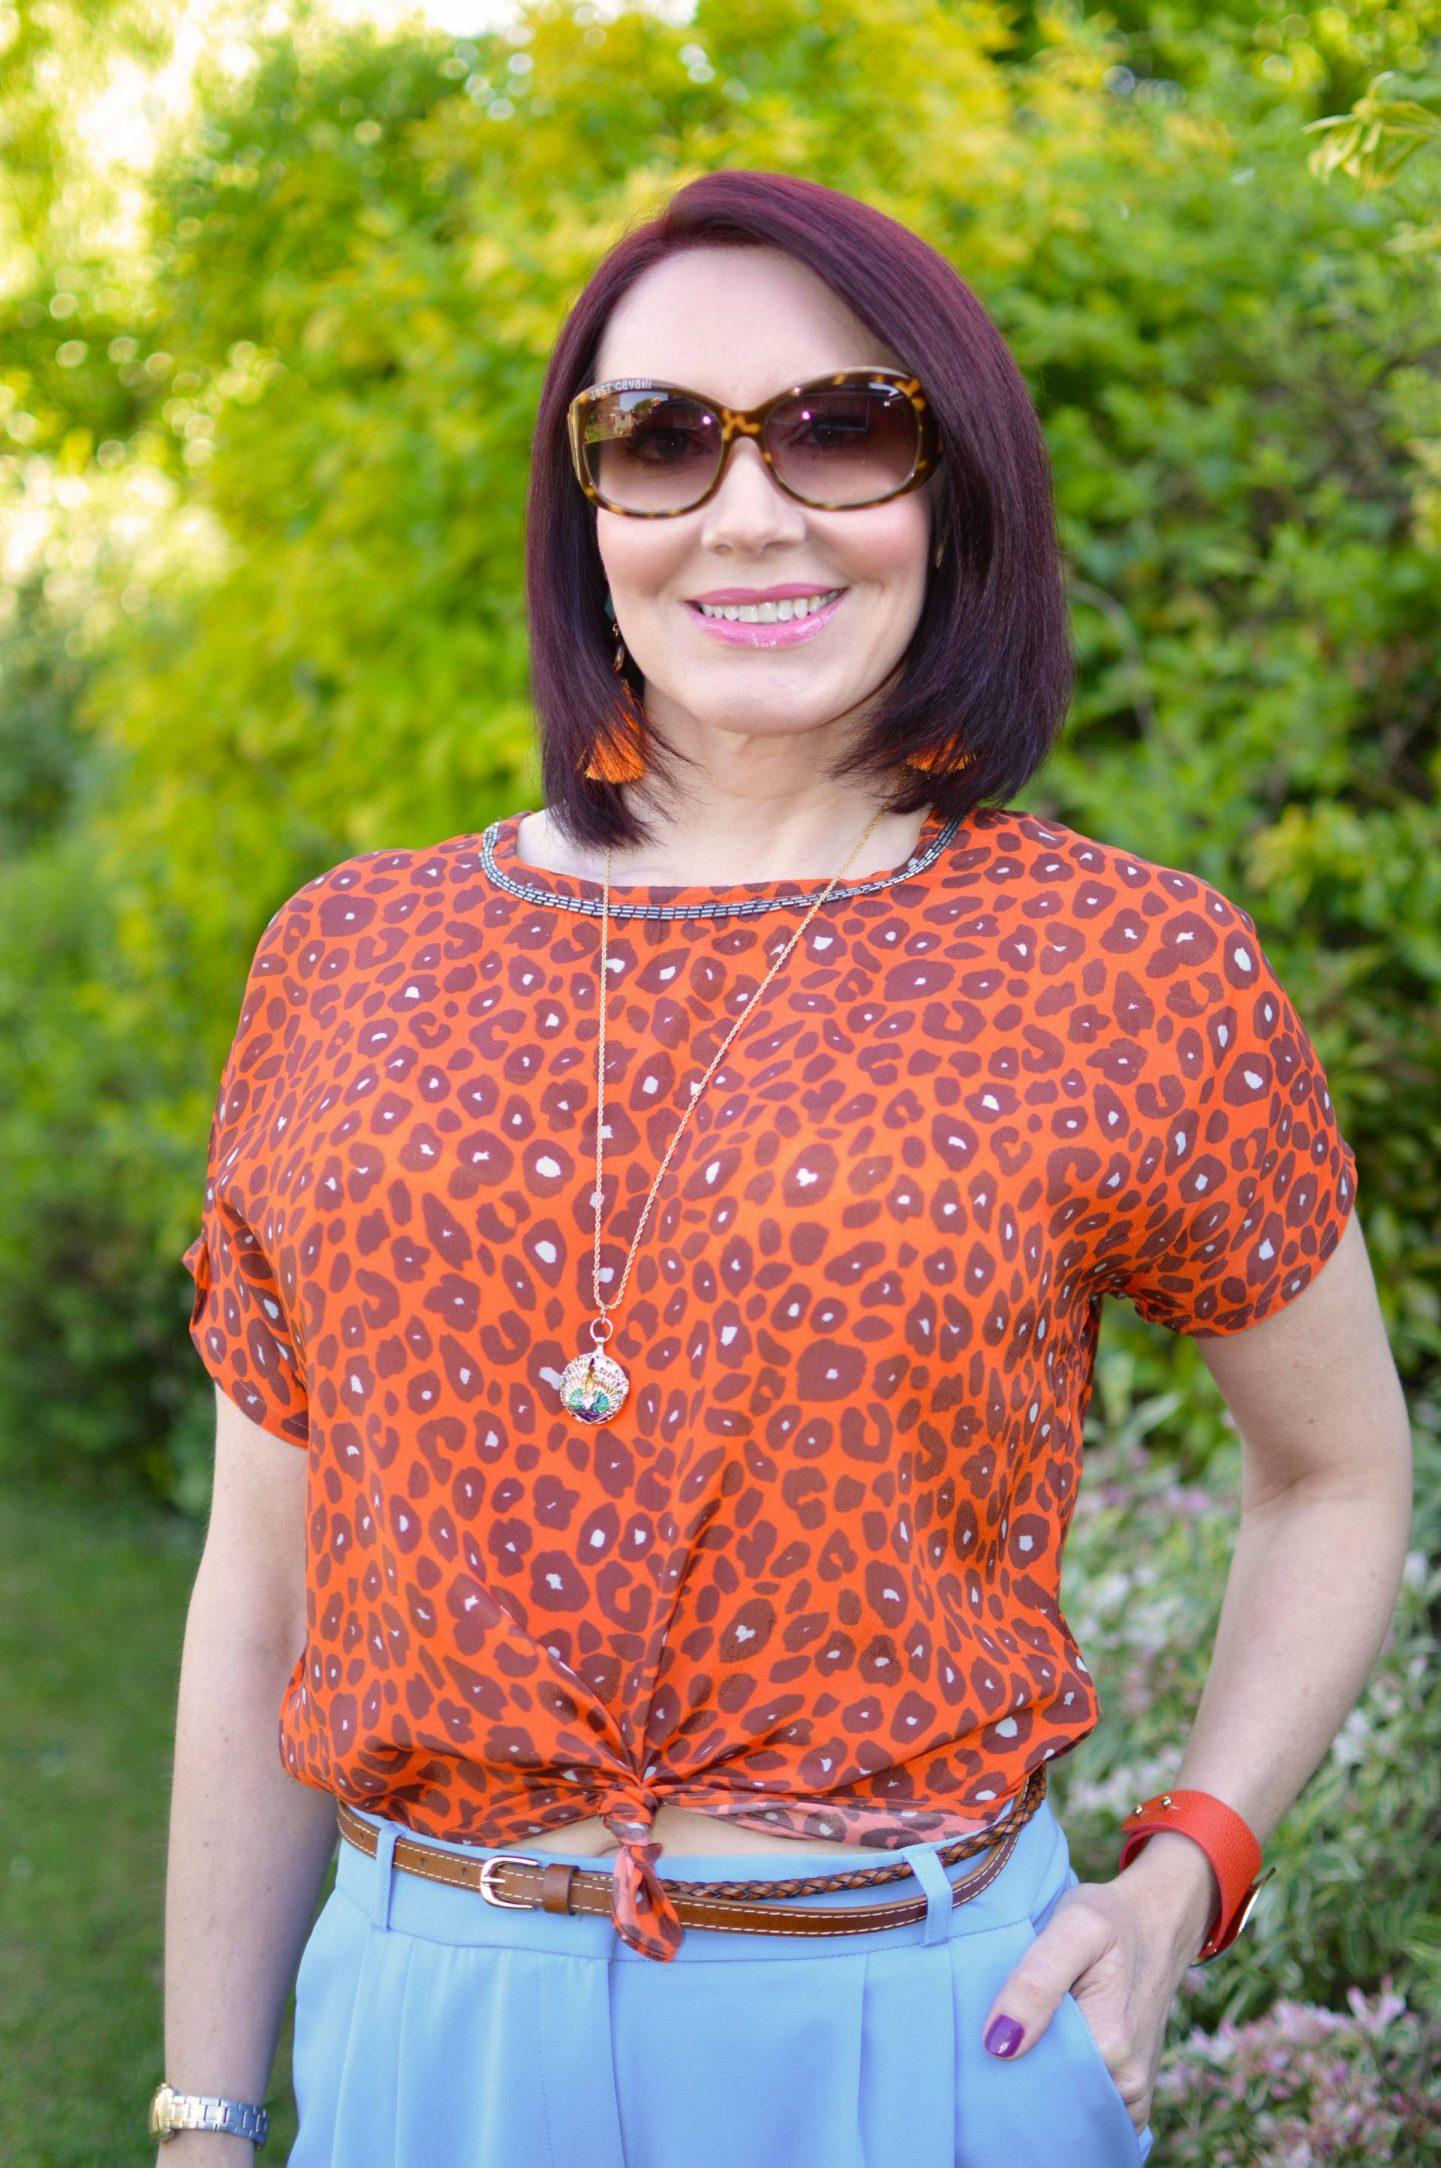 Blue and Bright Orange, Biba orange leopard print top, Asos orange velvet shoes